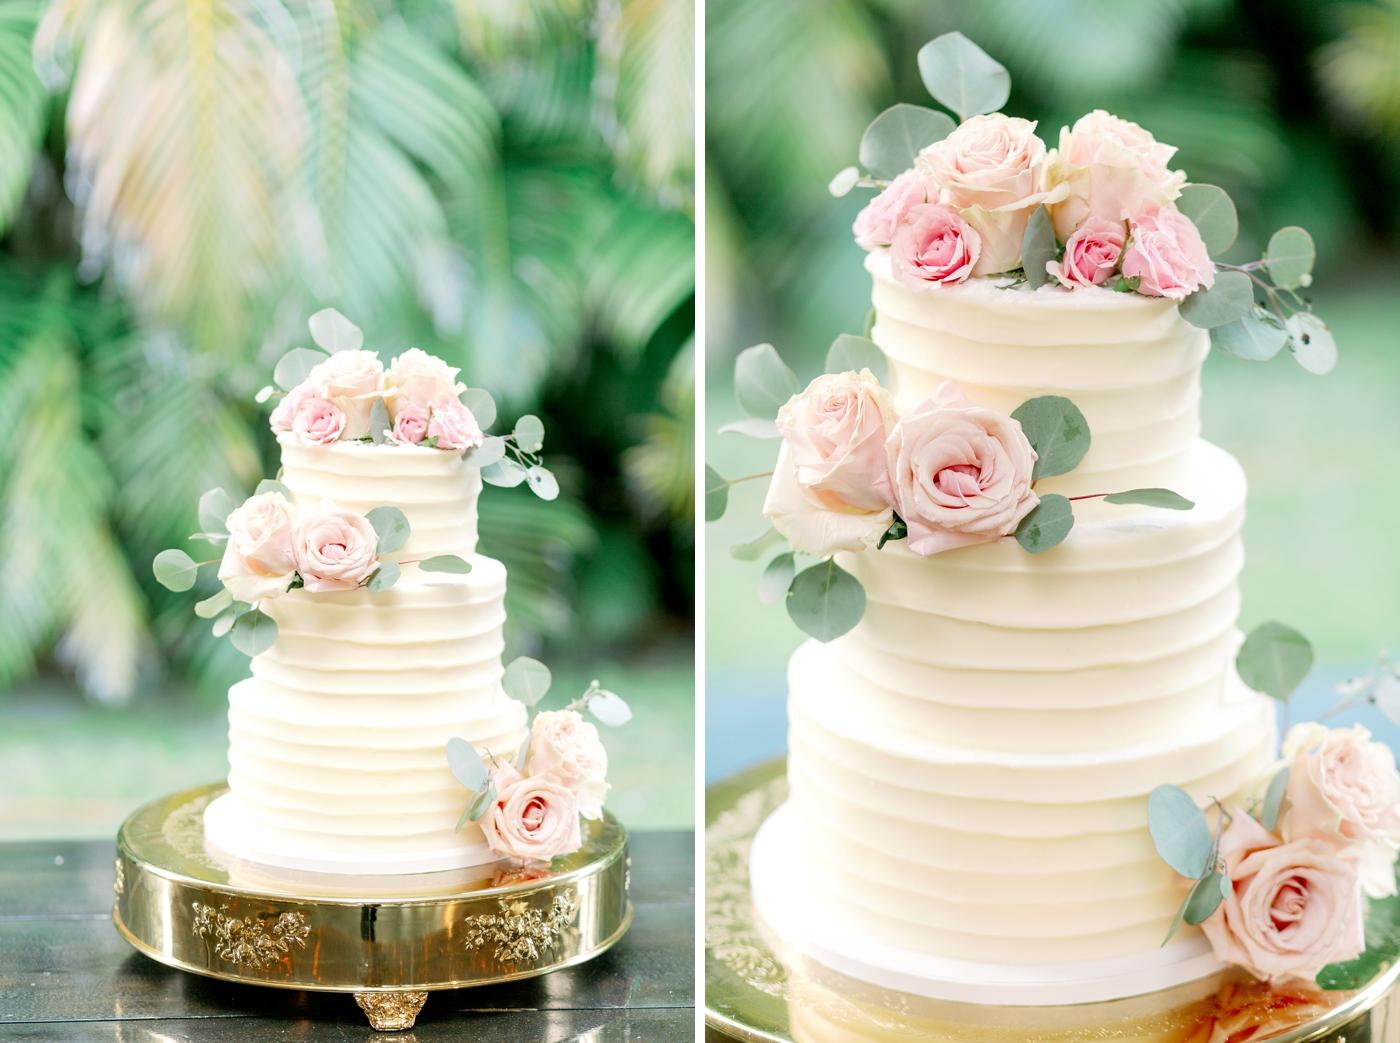 classy cupcakes